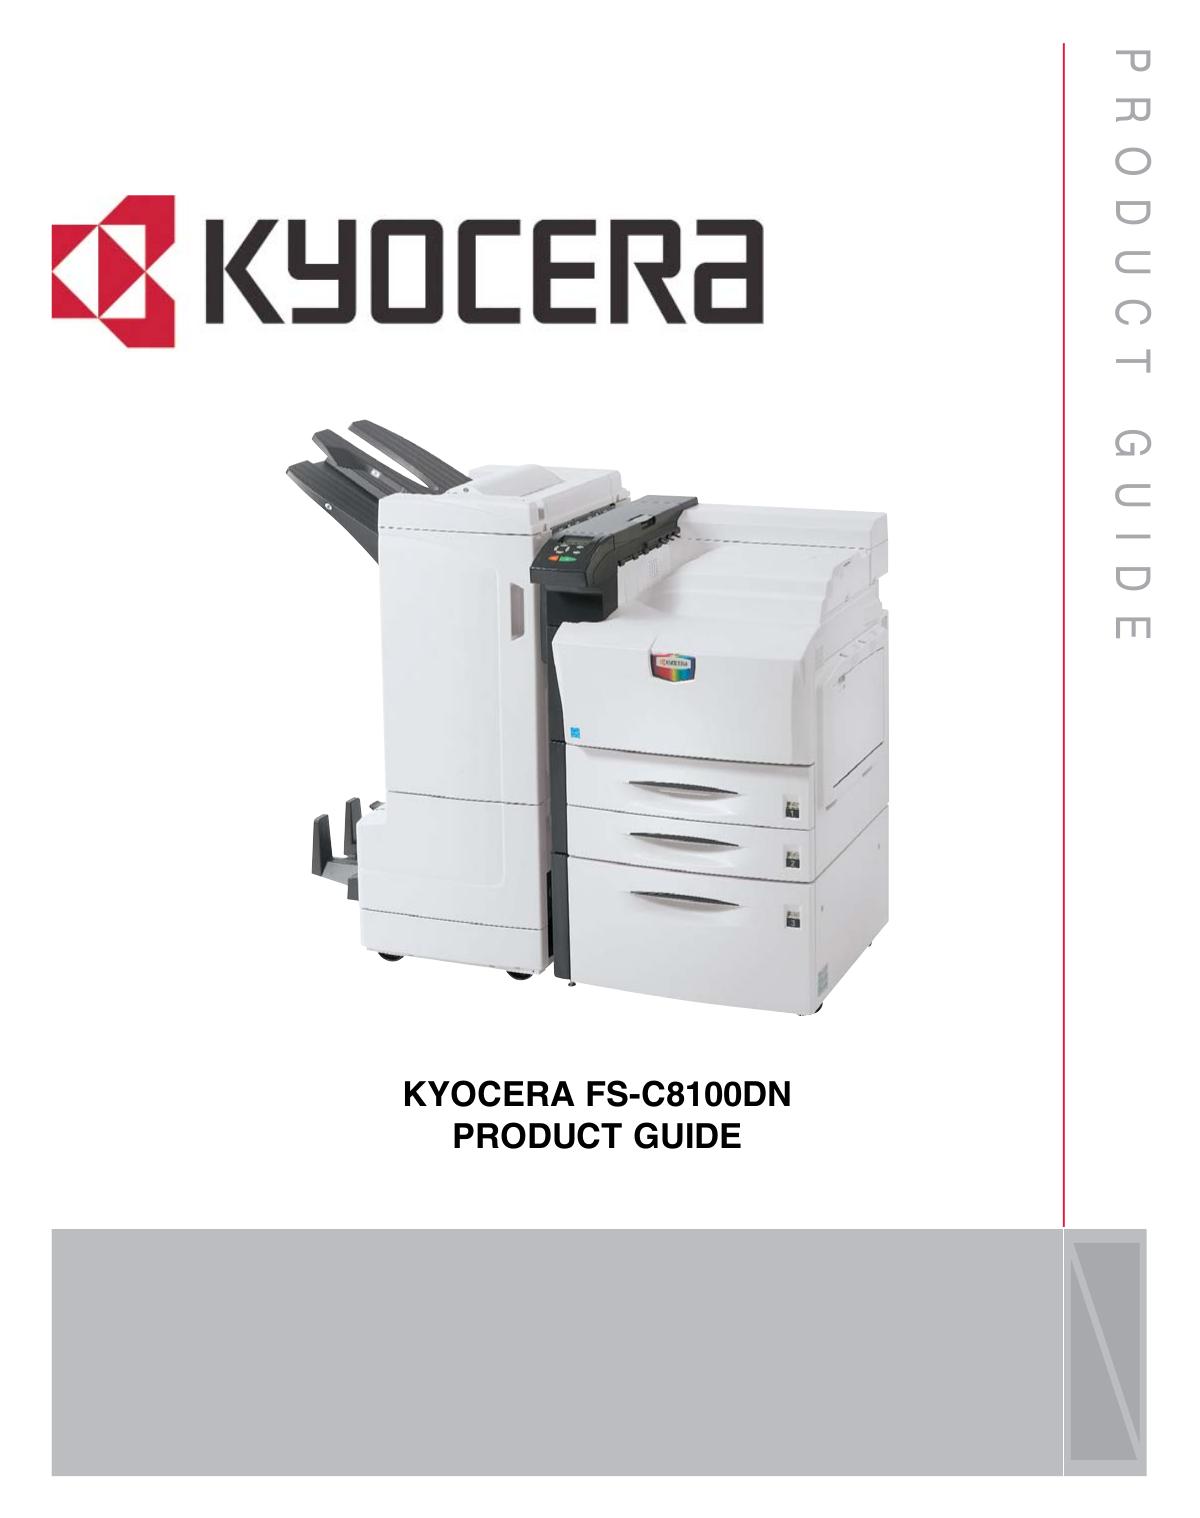 Kyocera fs 1118mfp manual download